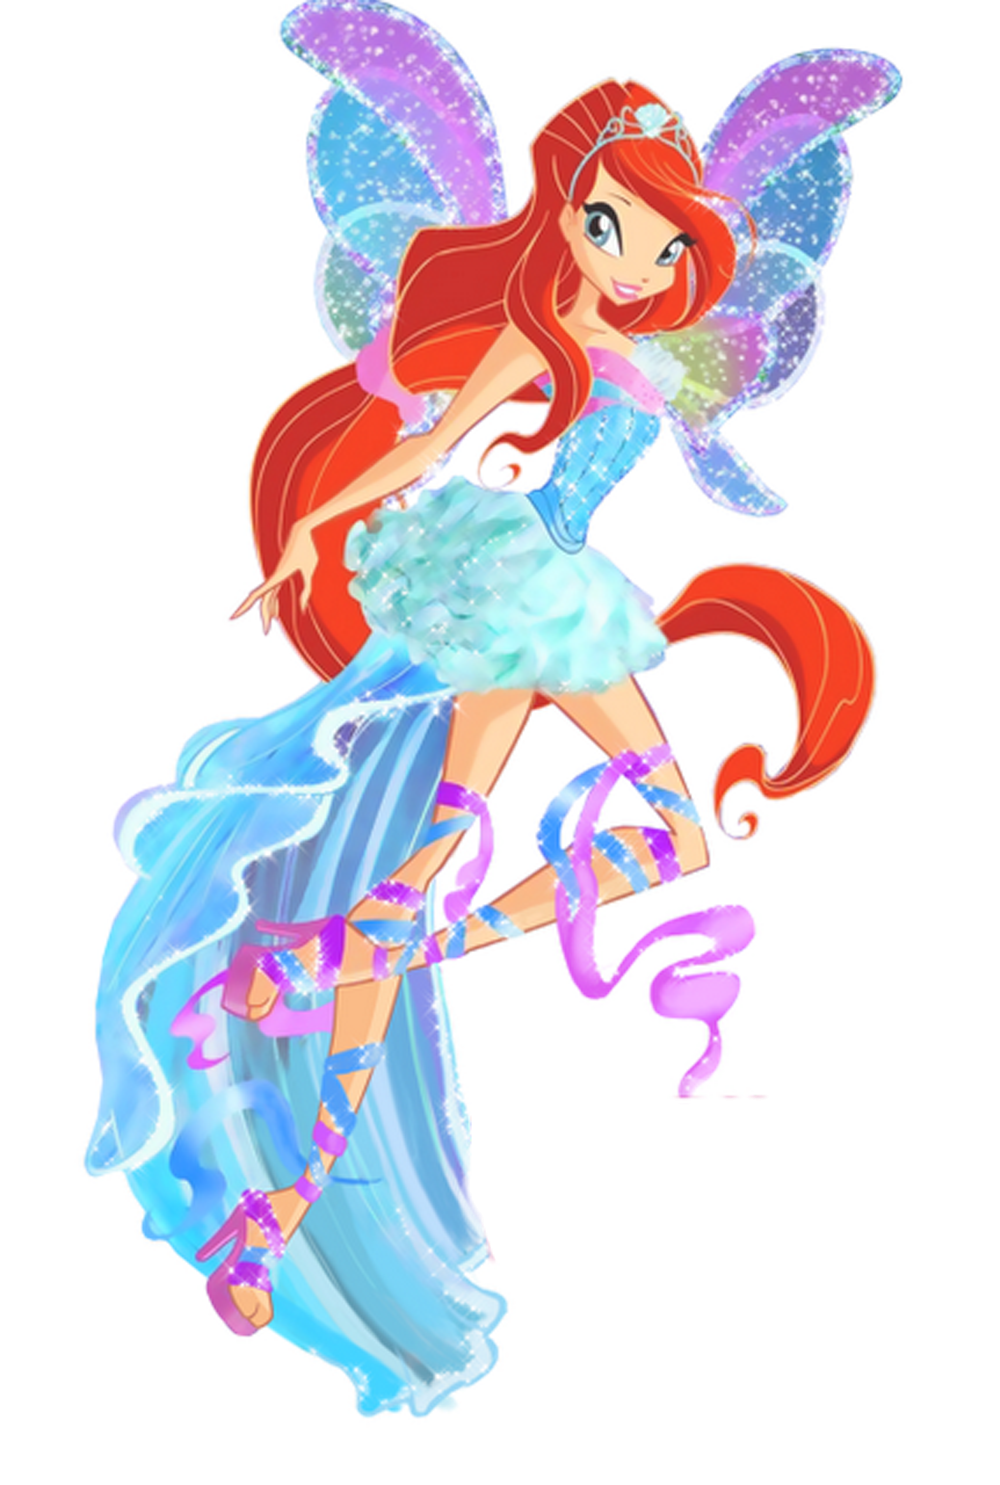 Winx-club-bloom-harmonix-sirenix.png